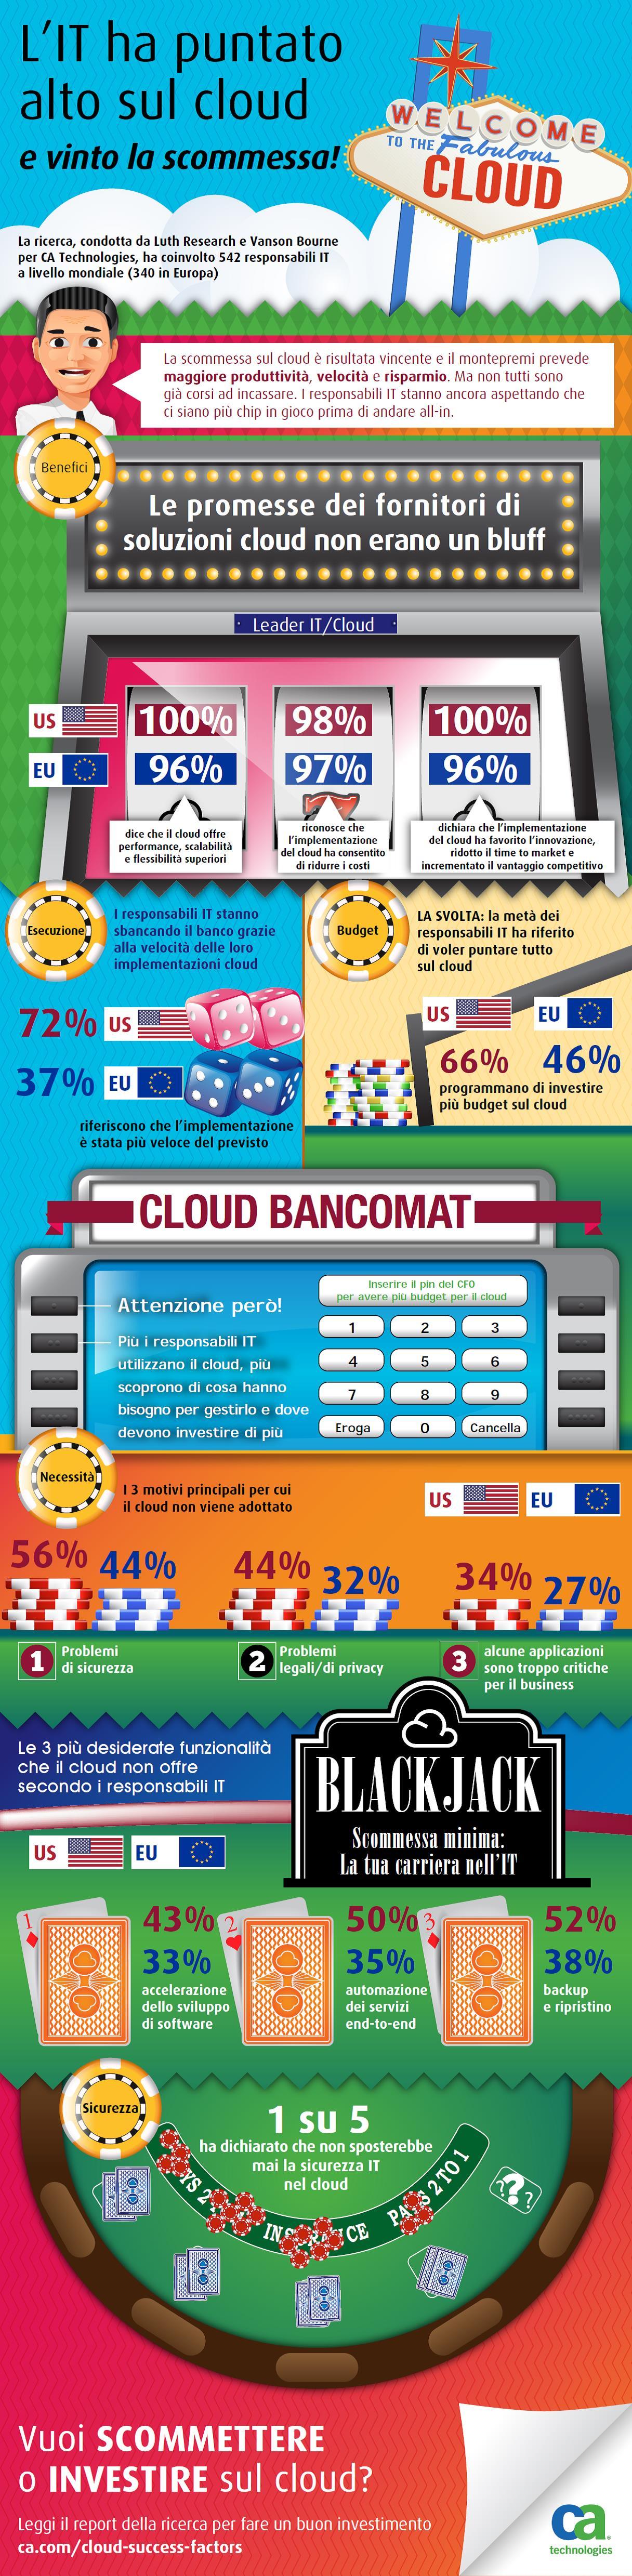 Infografica Cloud-CA-LuthResearch